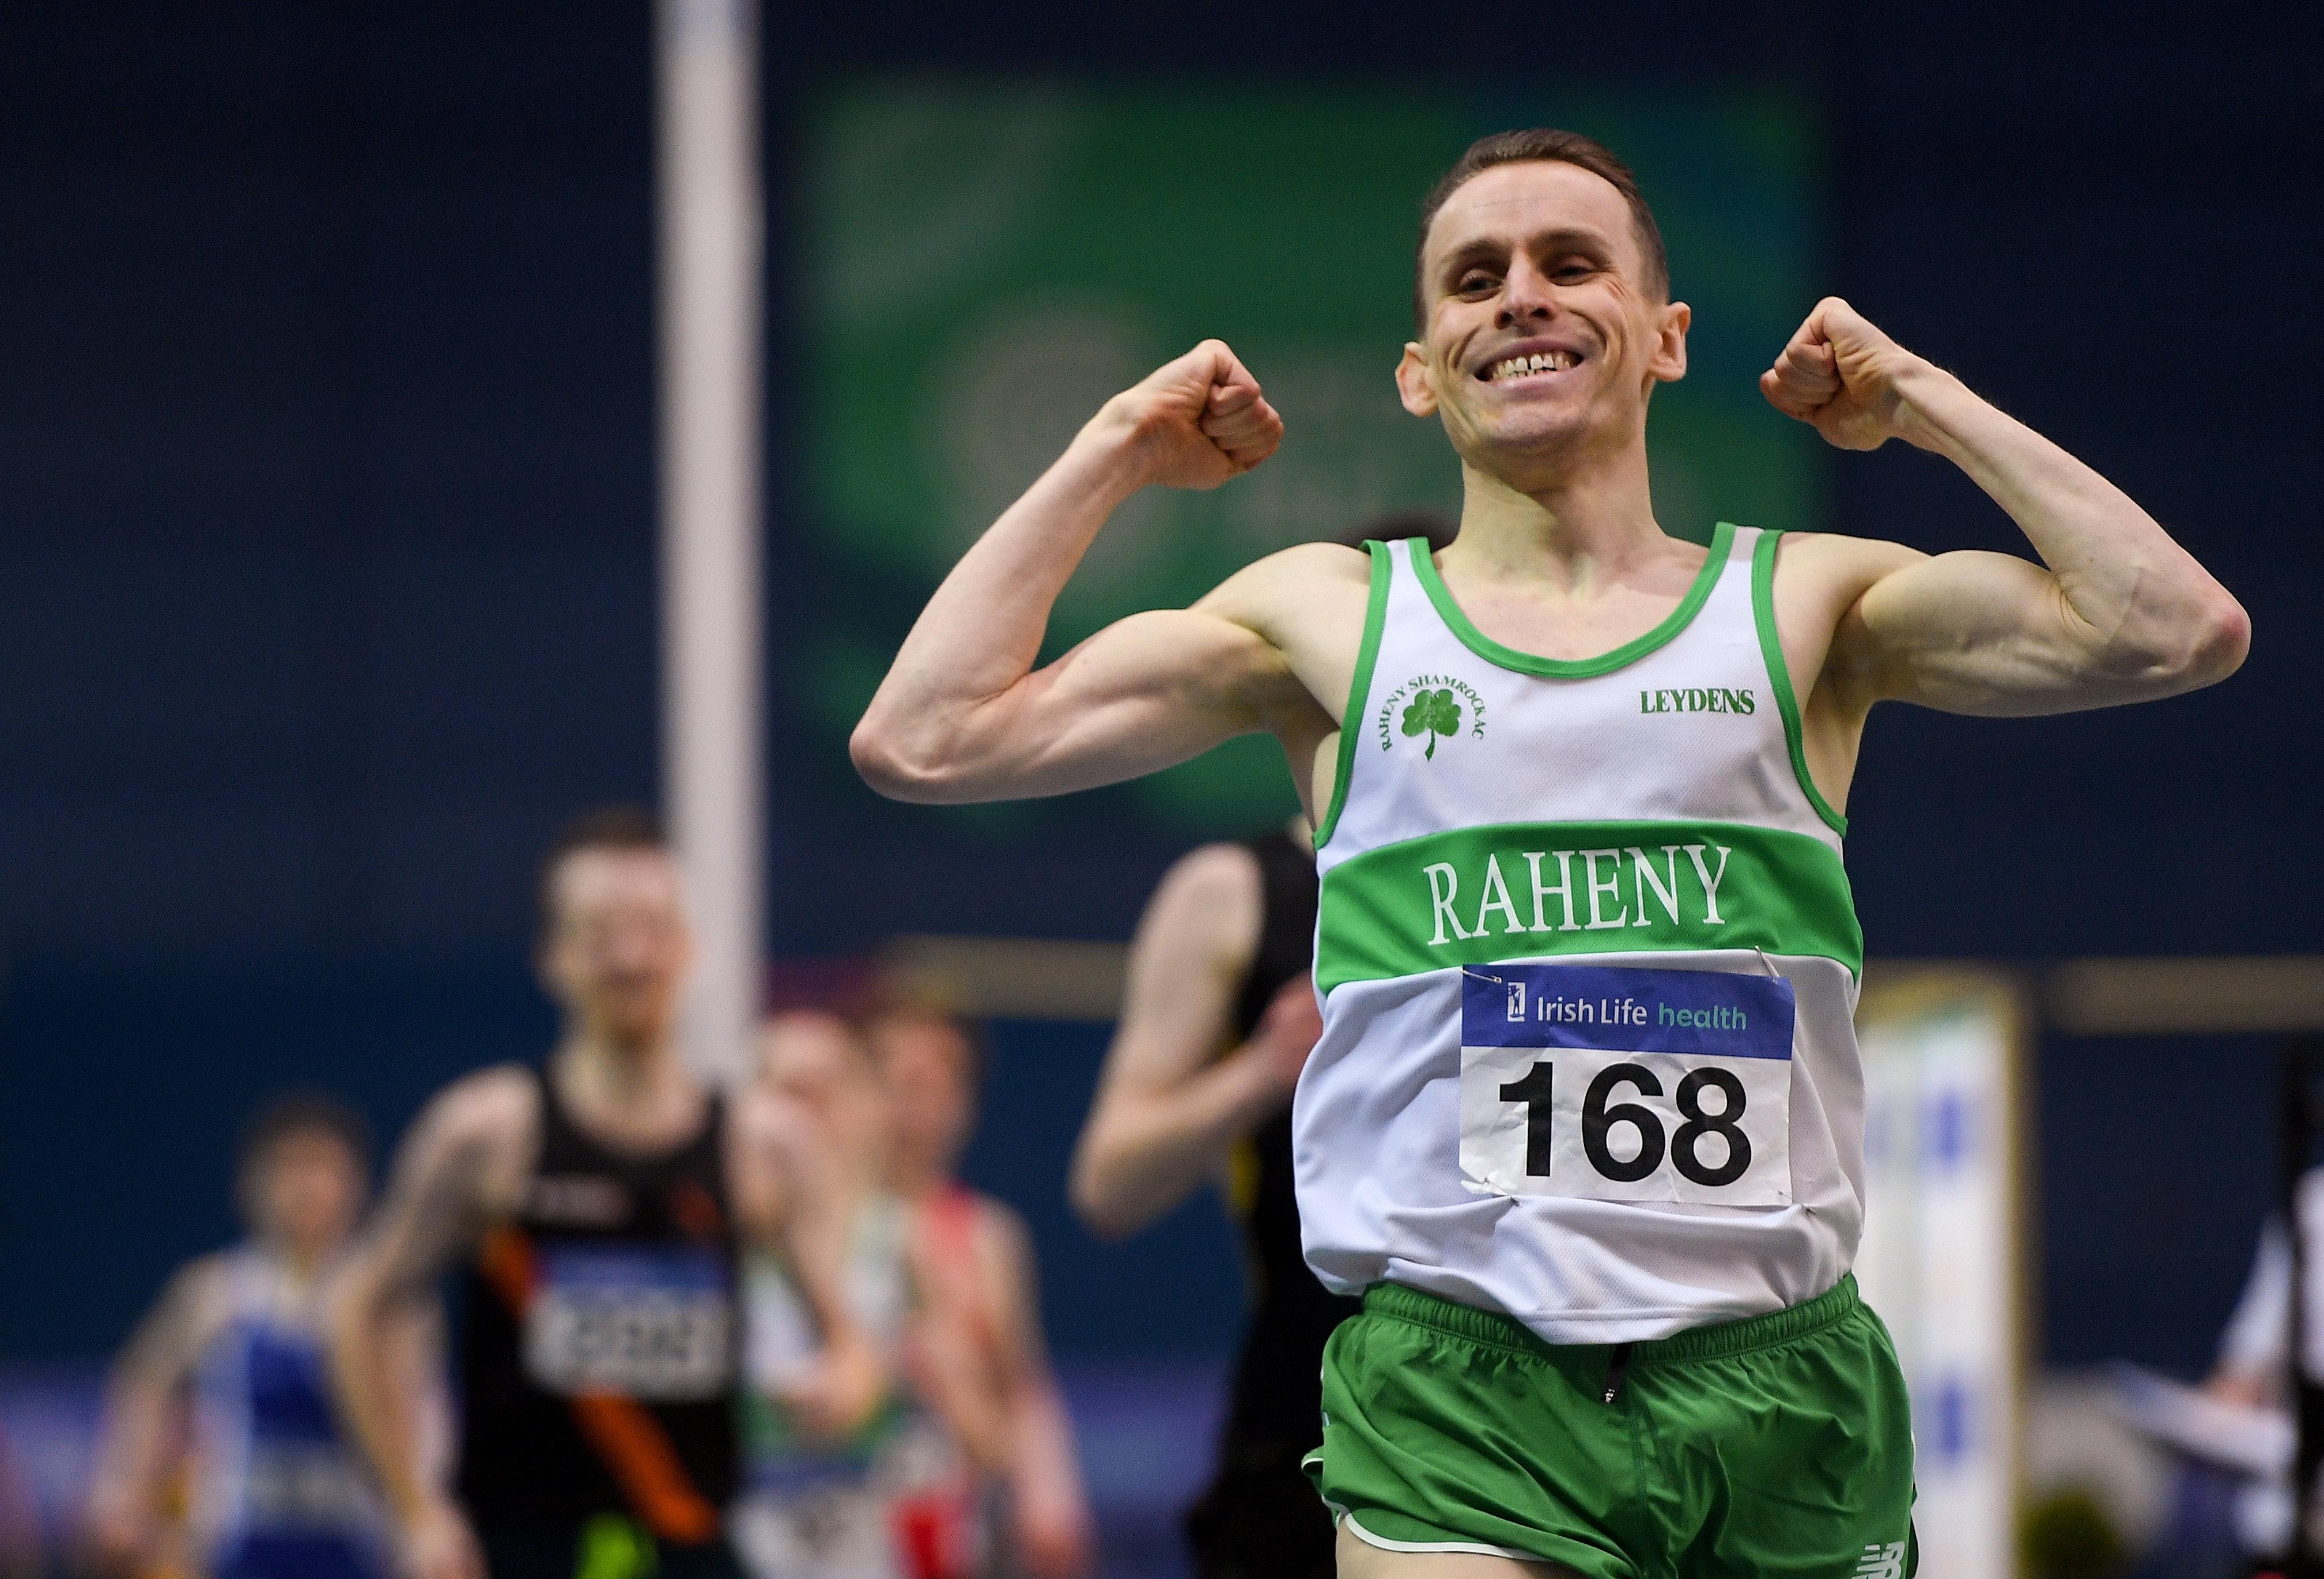 Irish Life Health National Senior Indoor Championships 2019